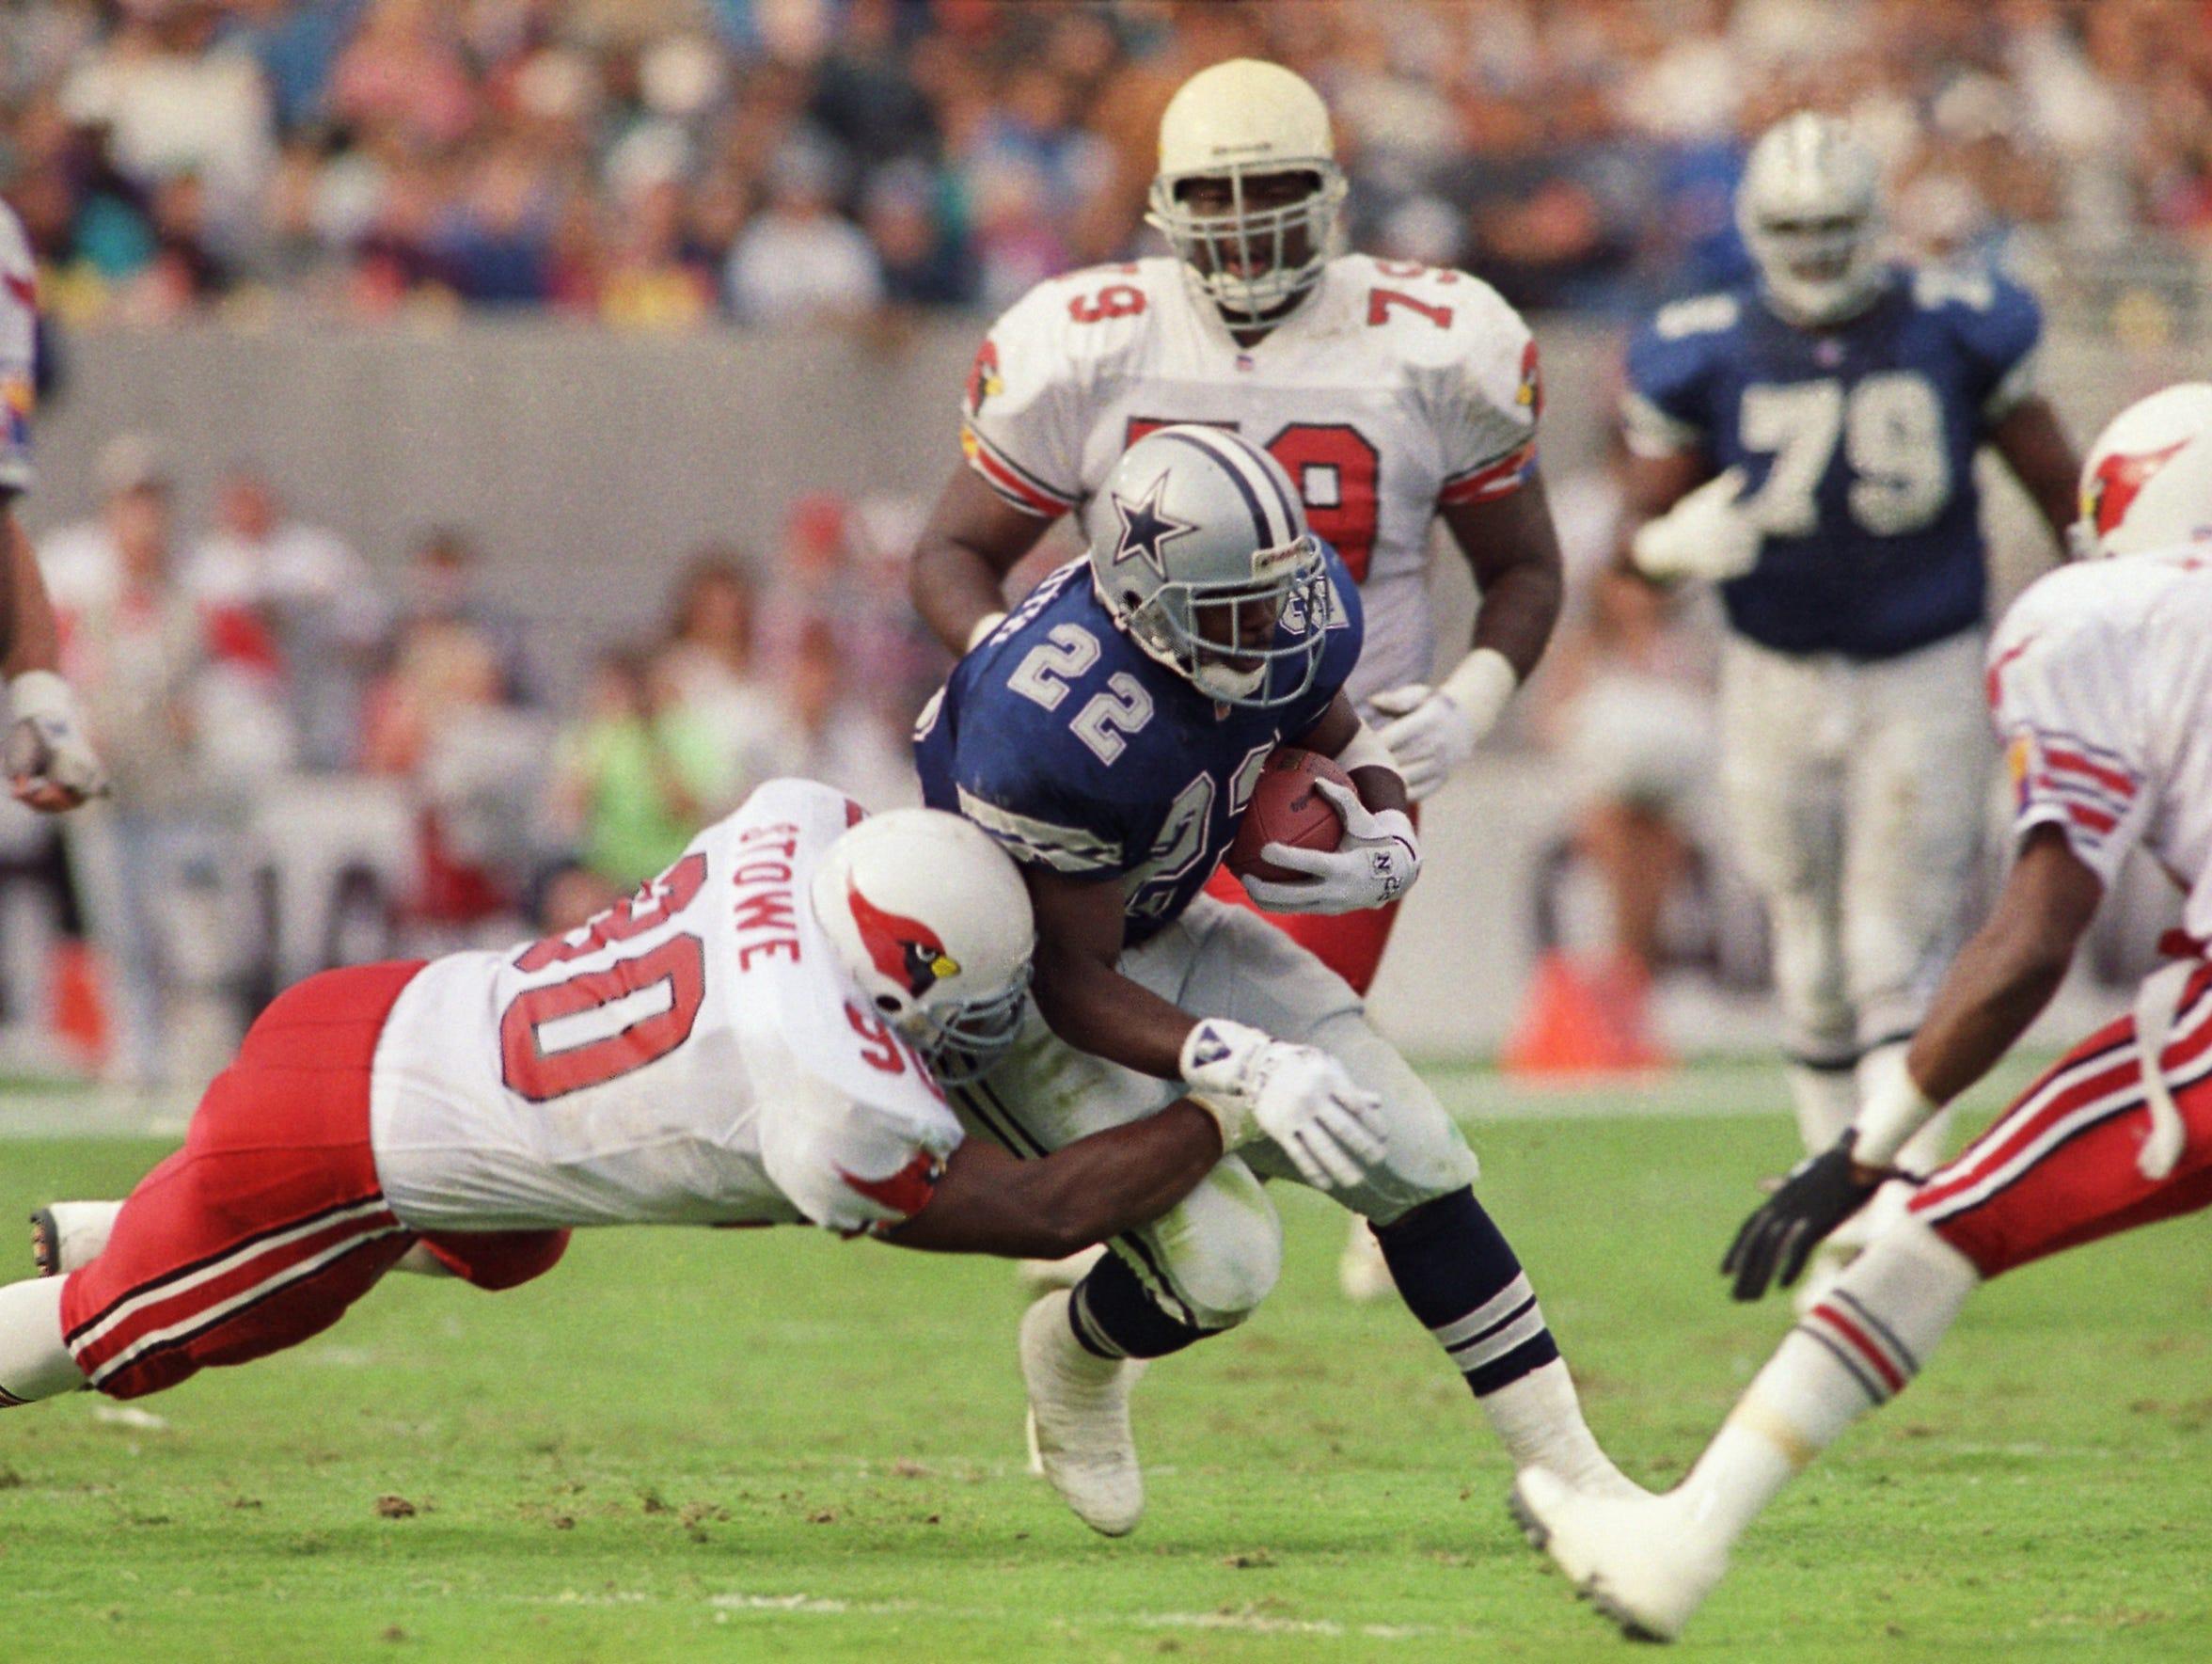 Dallas Cowboys running back Emmitt Smith (22) pulls